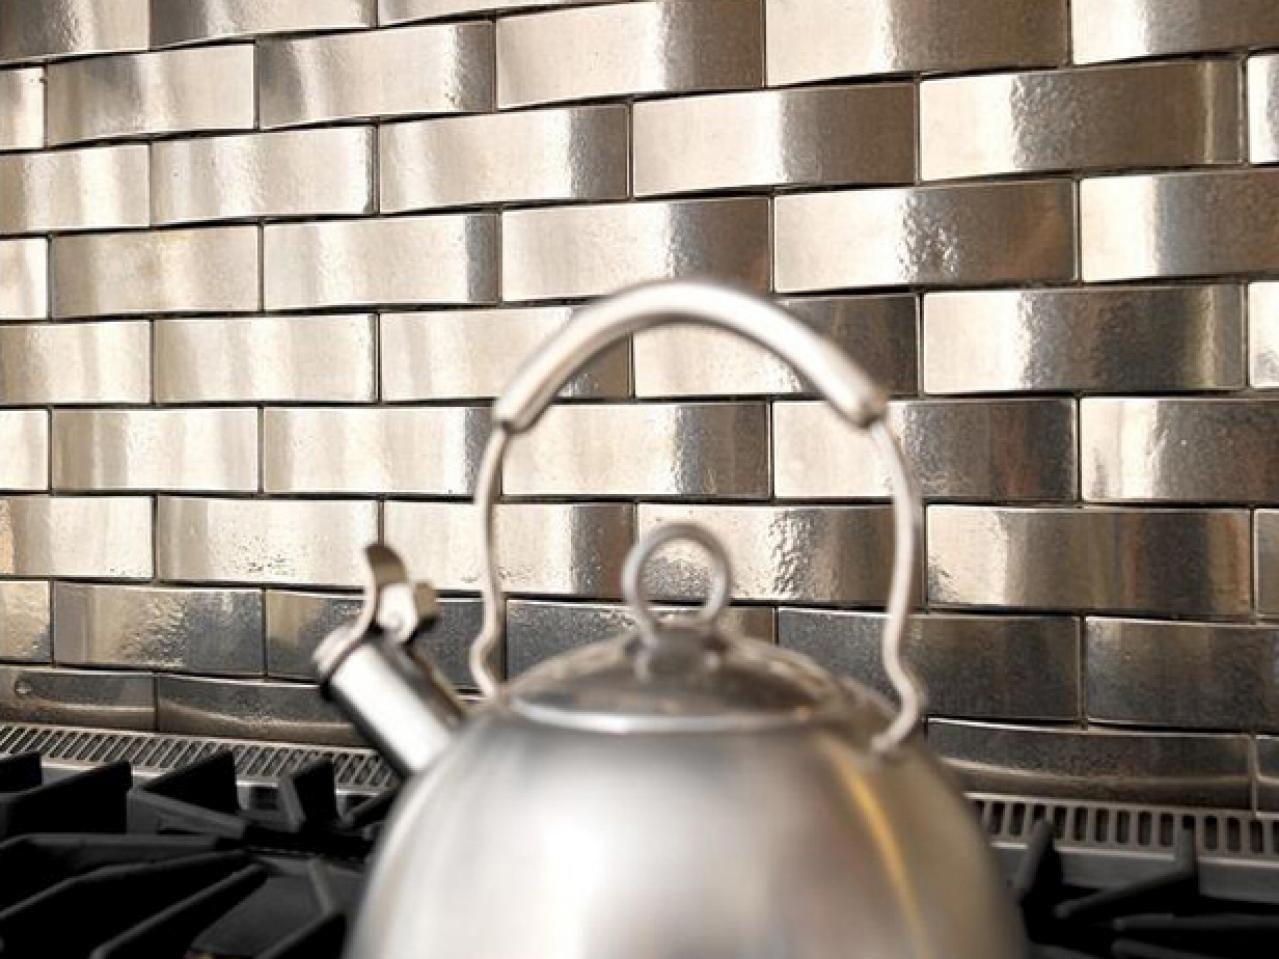 Pictures of Beautiful Kitchen Backsplash Options & Ideas ...